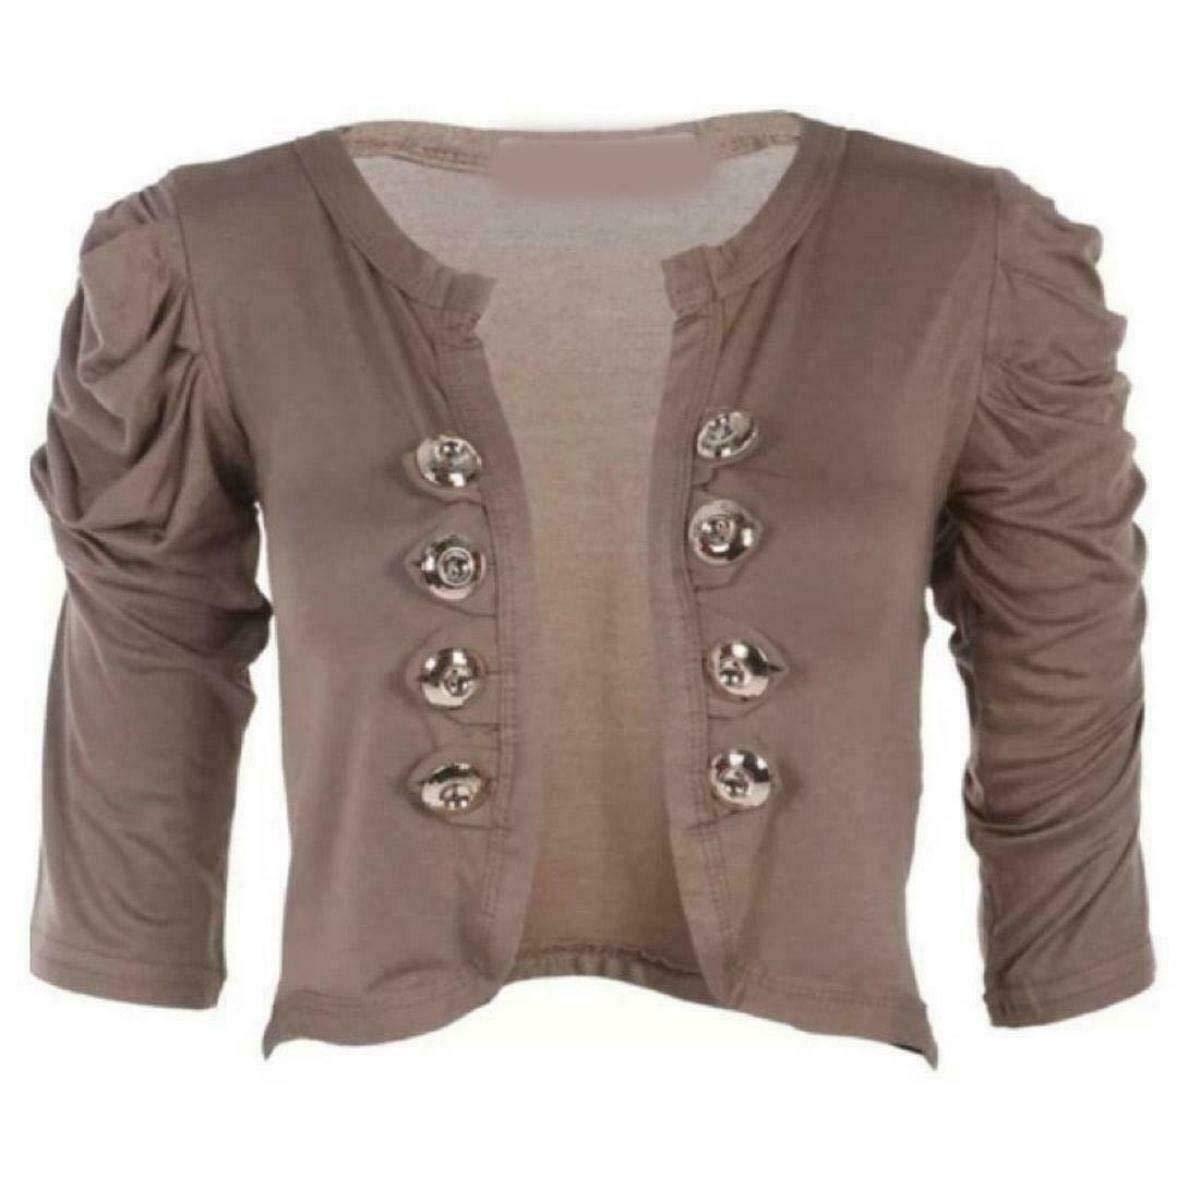 NAZ Fashion Damen Plain /& Printed Military 8 Button 3//4 Geraffte Bolero Bolero Shrug Strickjacke EU 36-42